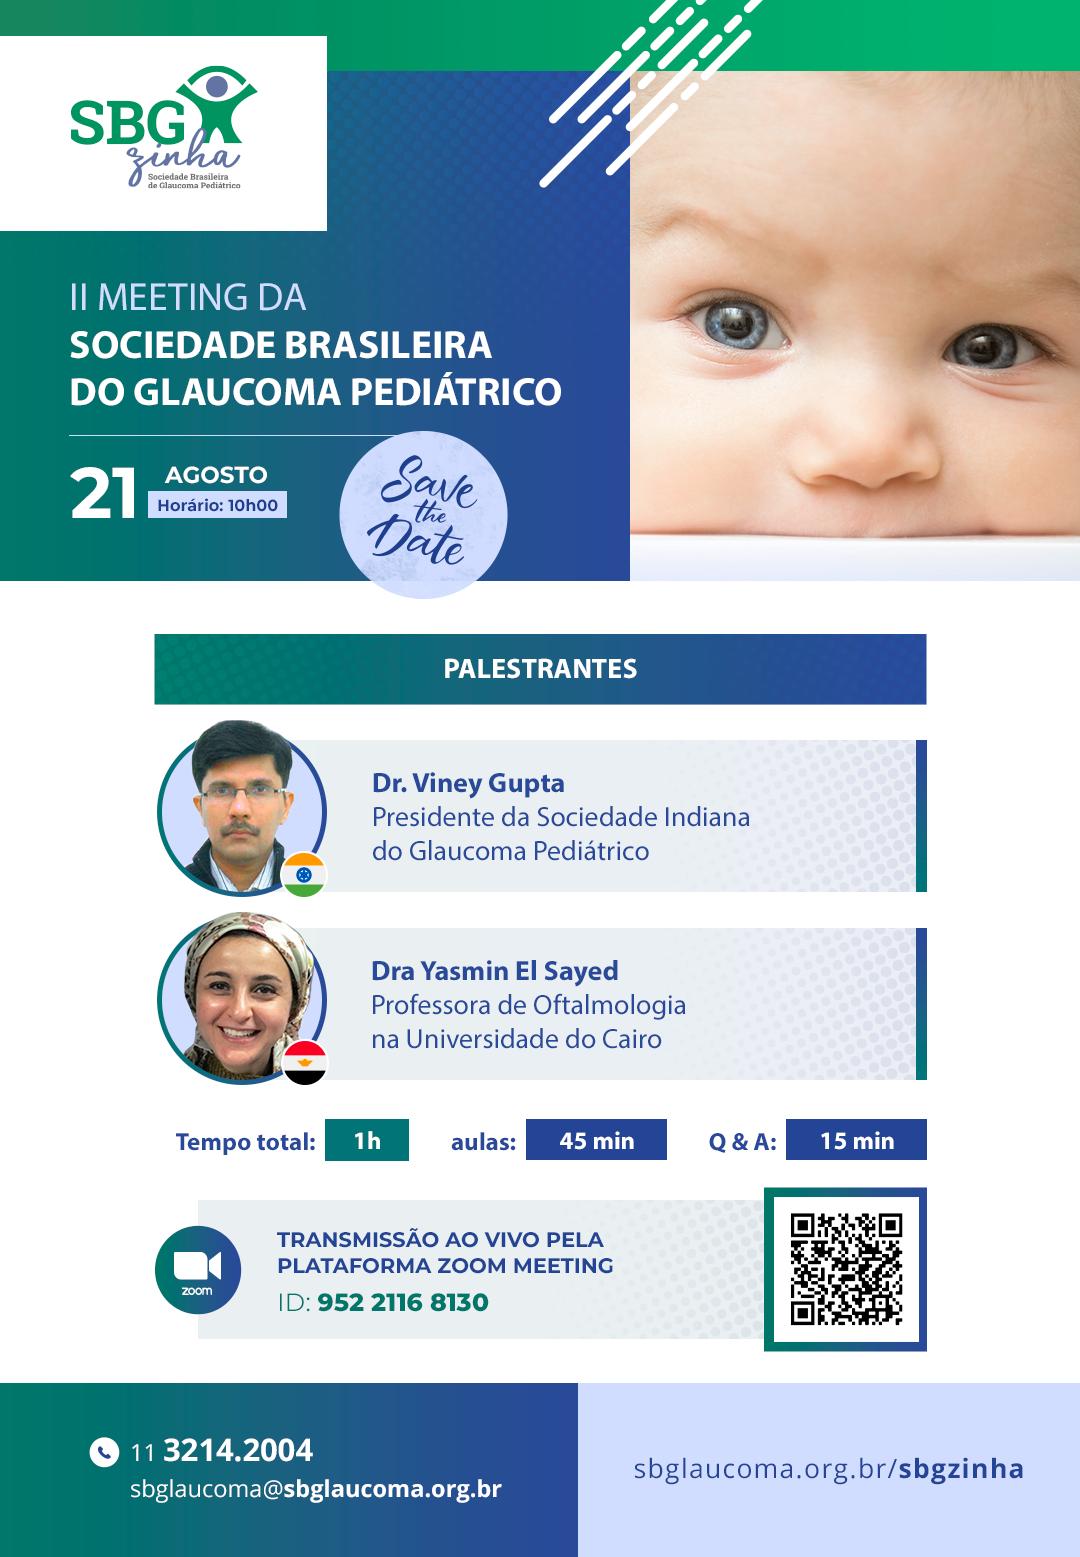 2021-05-10-newsletter-sbgzinha-glaucoma